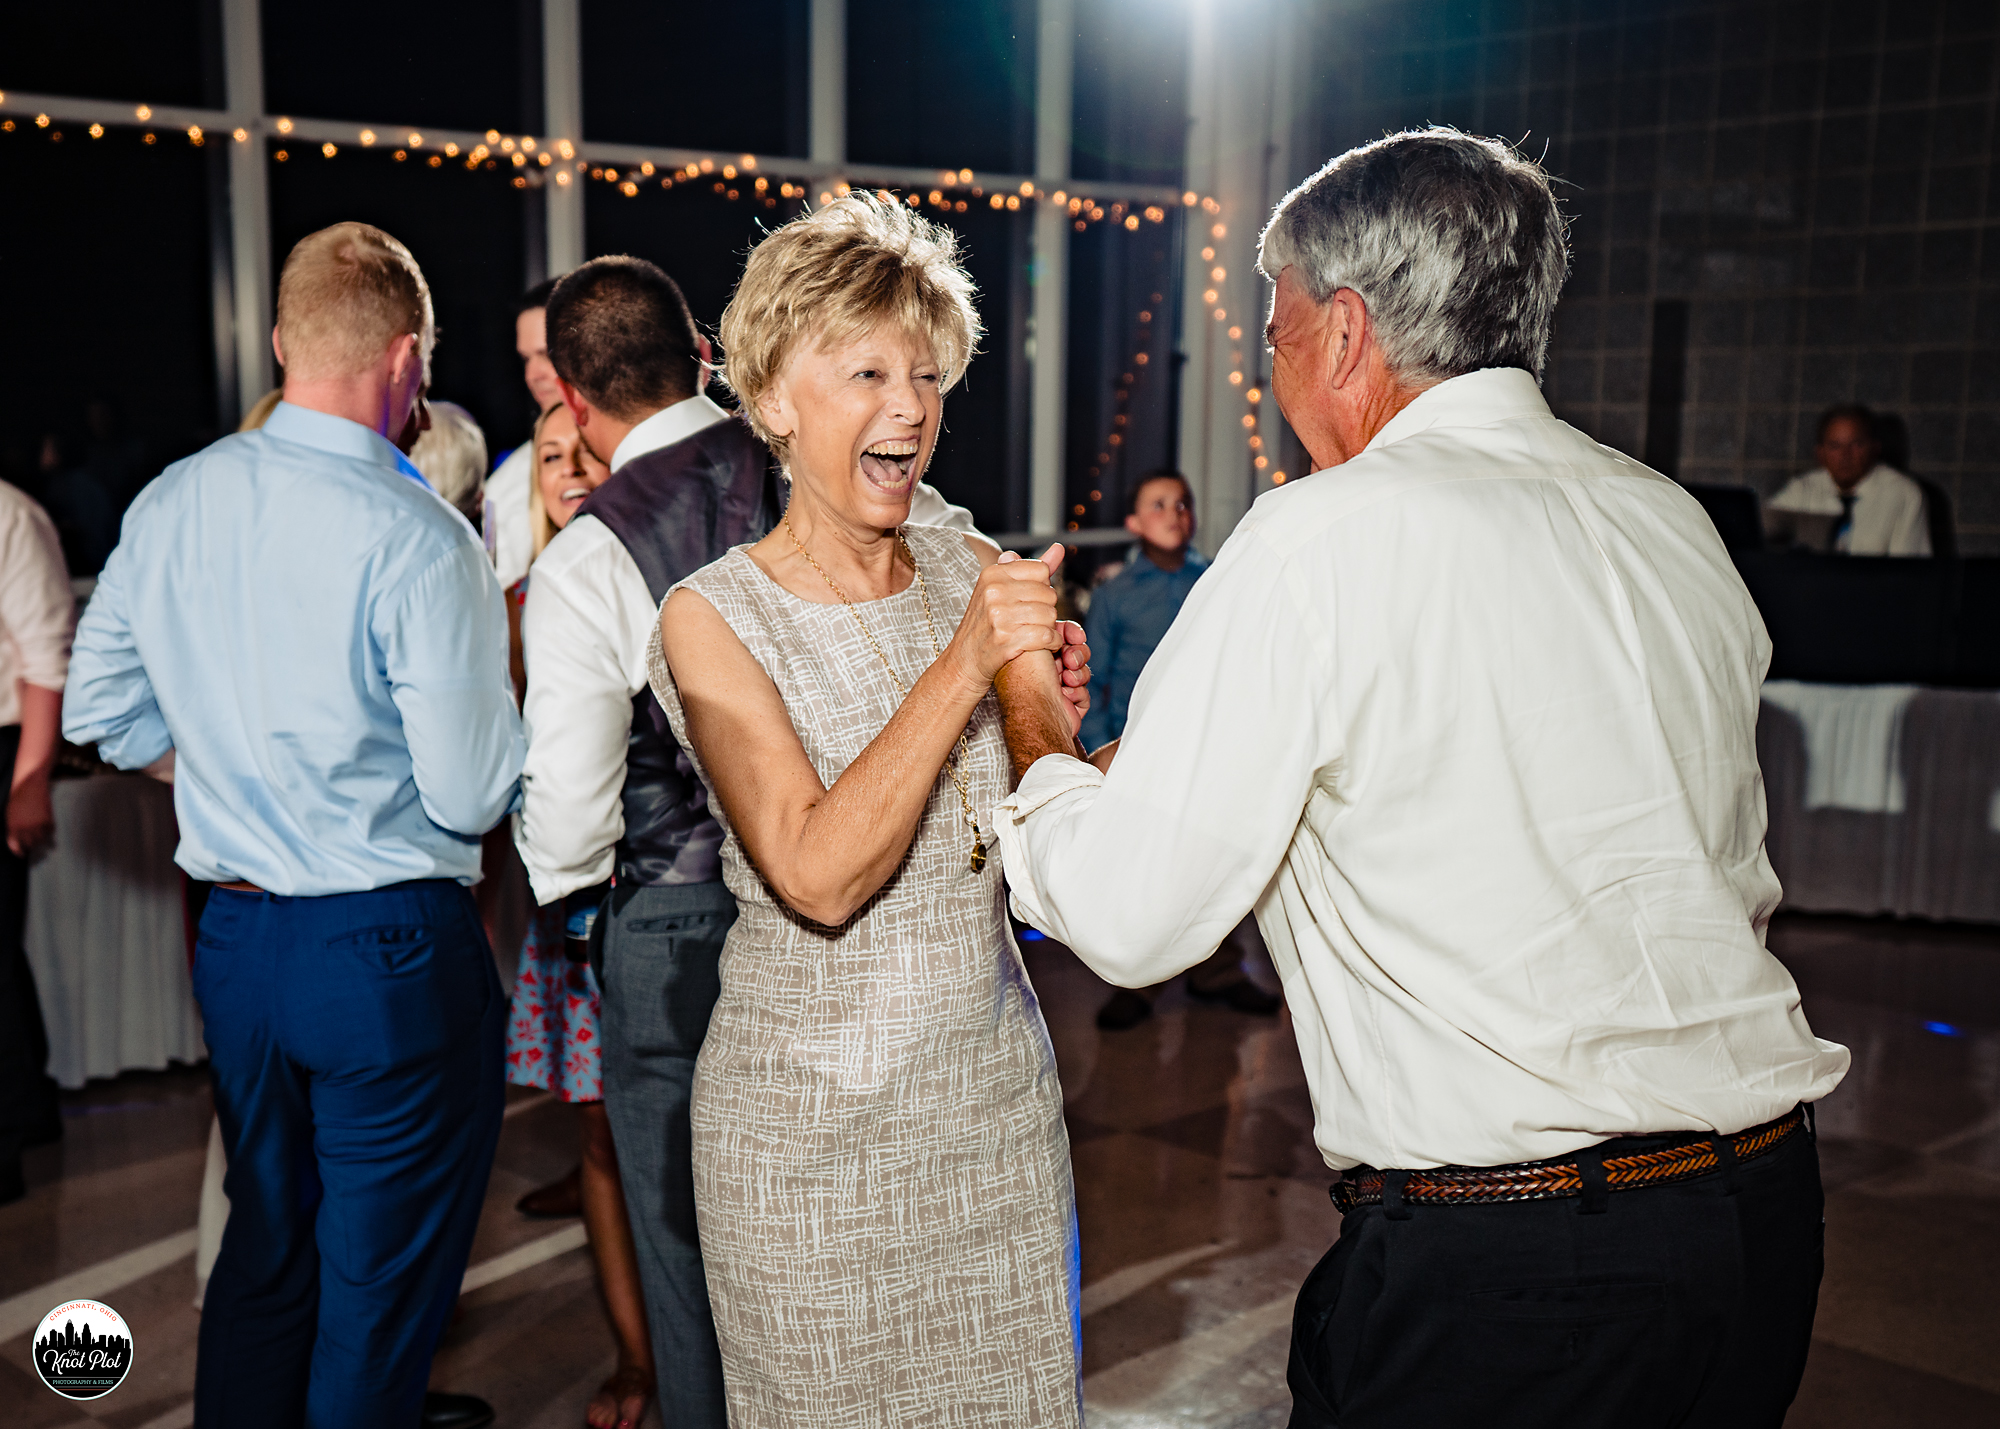 Southgate-Community-Center-KY-Wedding-Photography-30.jpg